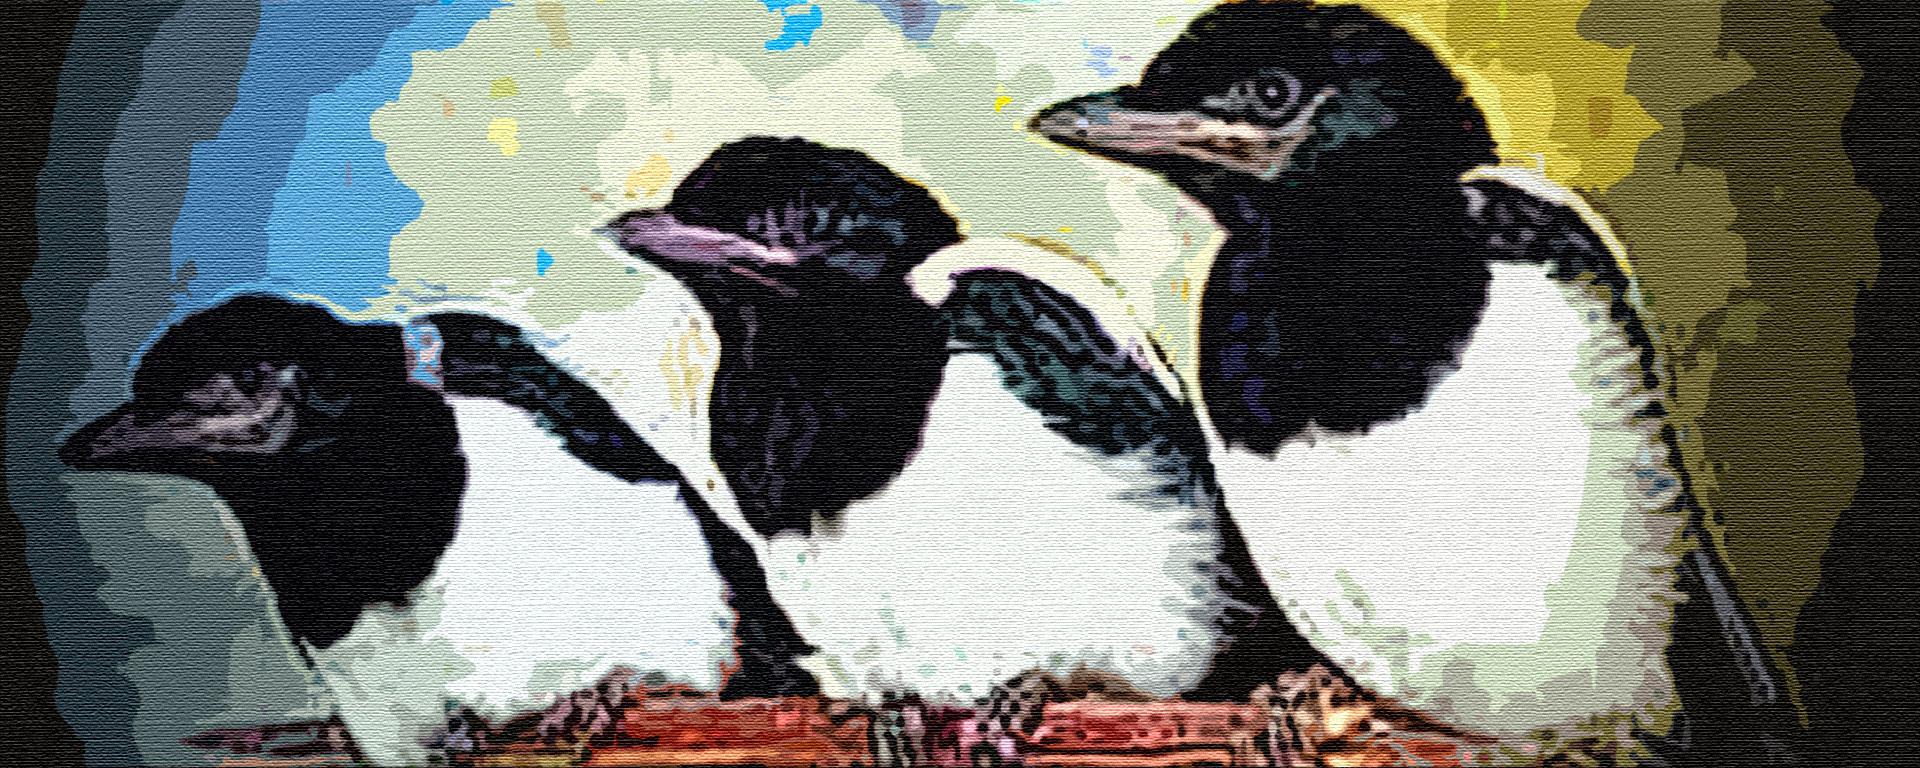 Сорока и ее птенцы